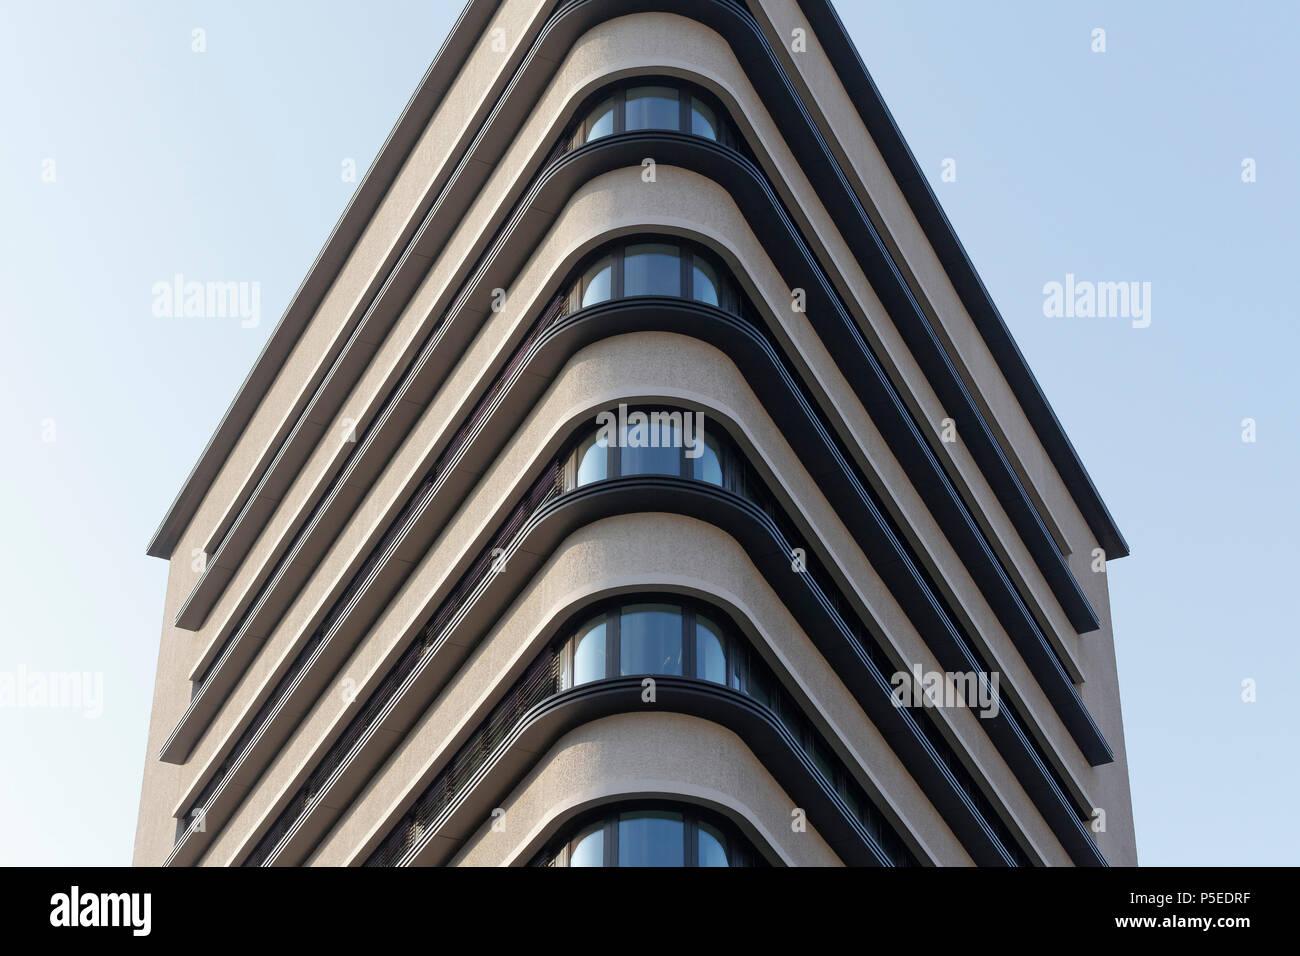 Triangular office tower, Trias high-rise, architects Schulz & Schulz, Leipzig, Saxony, Germany - Stock Image